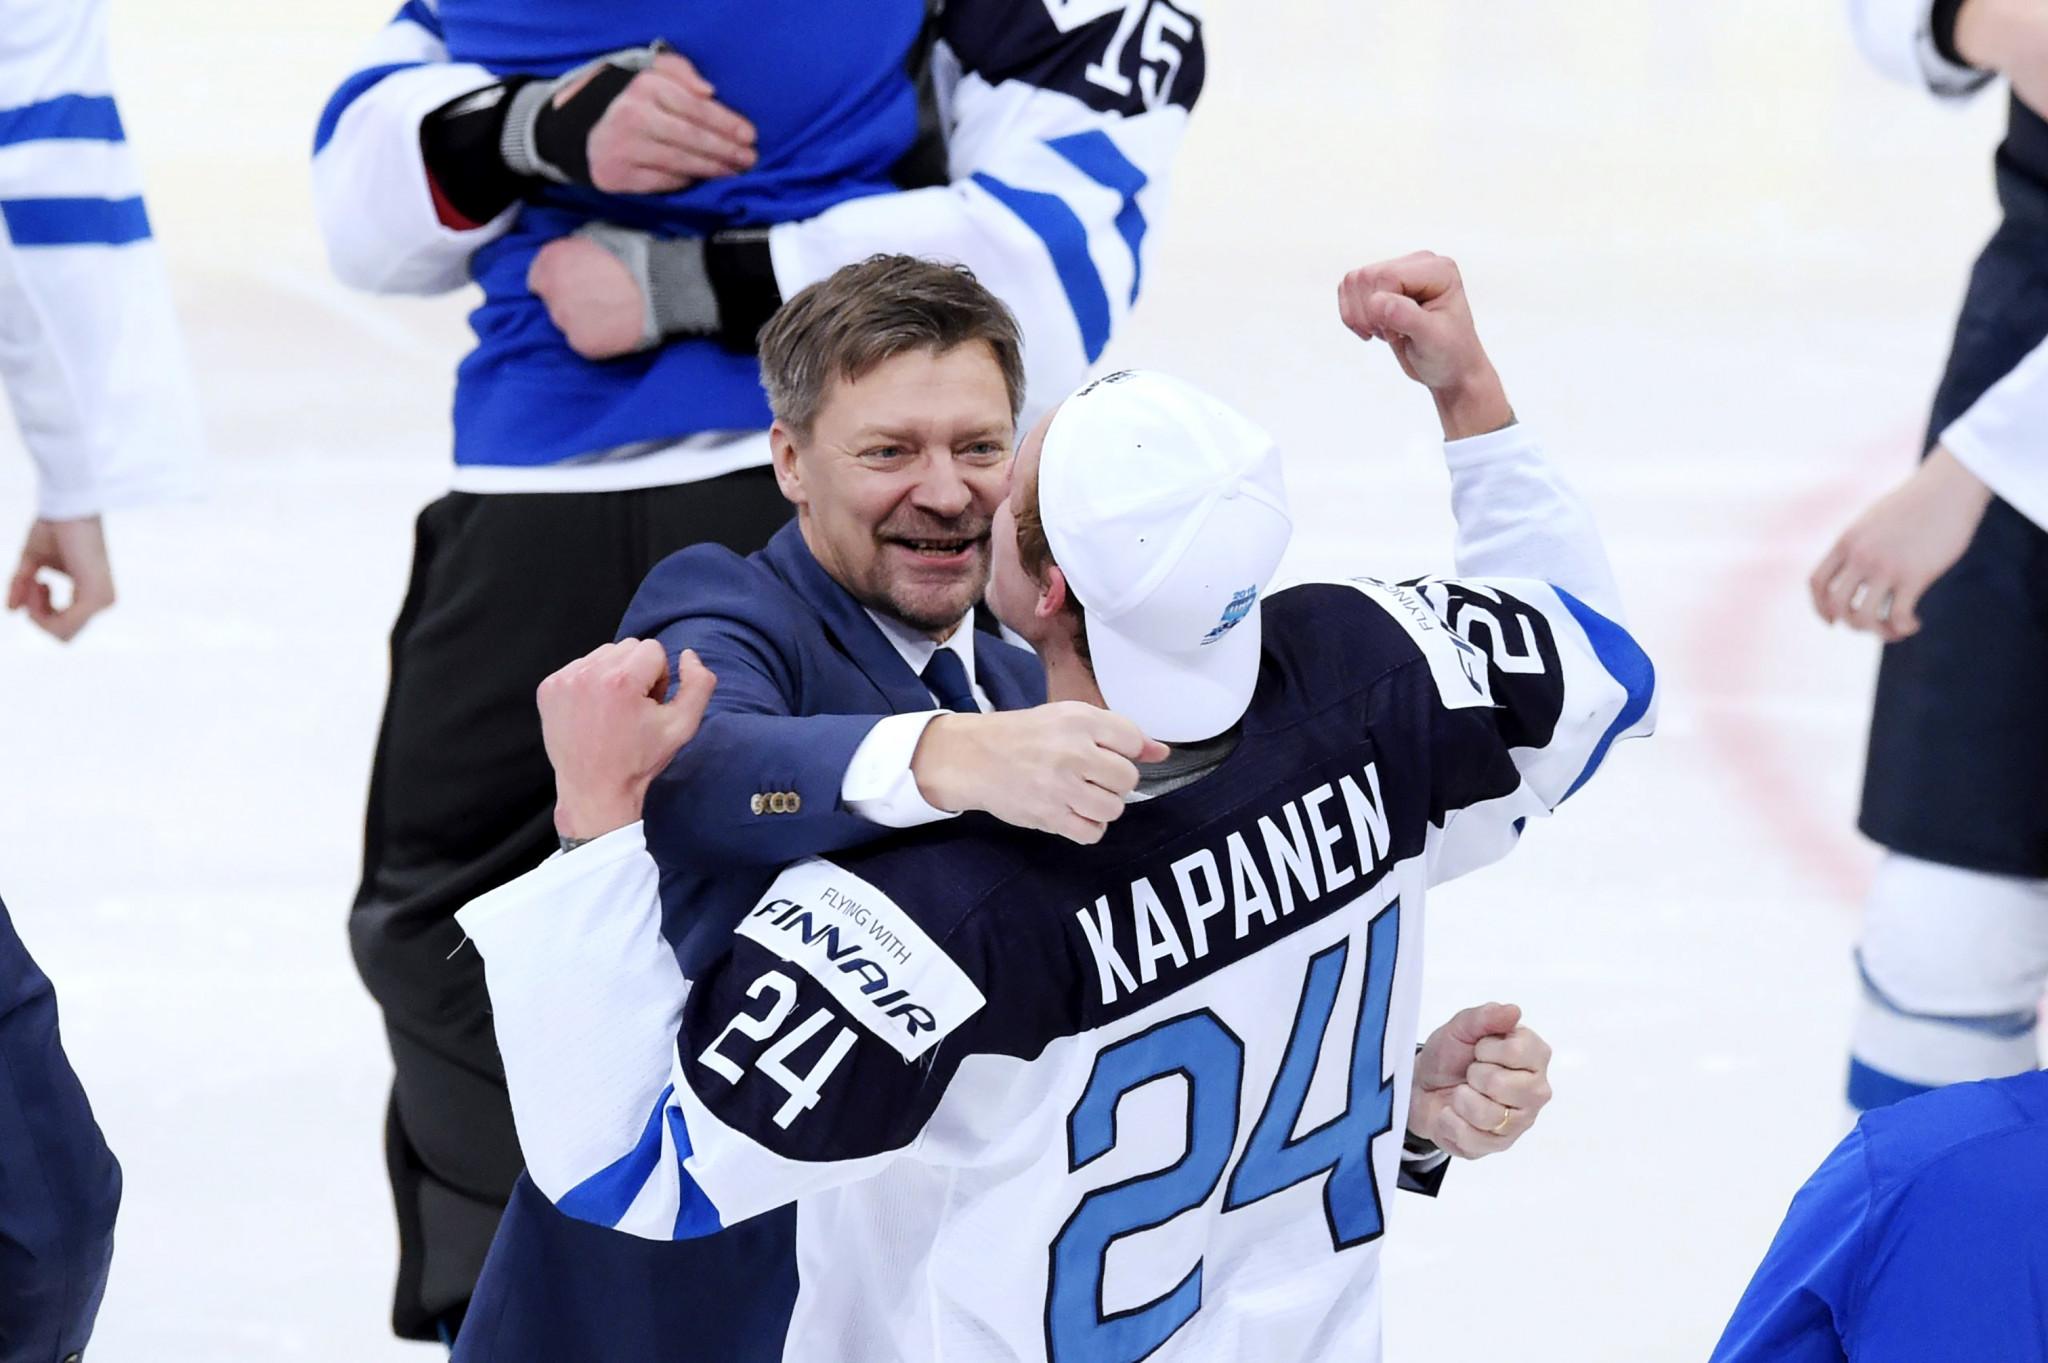 Double World Championship winner Jalonen extends contract with Finnish ice hockey team